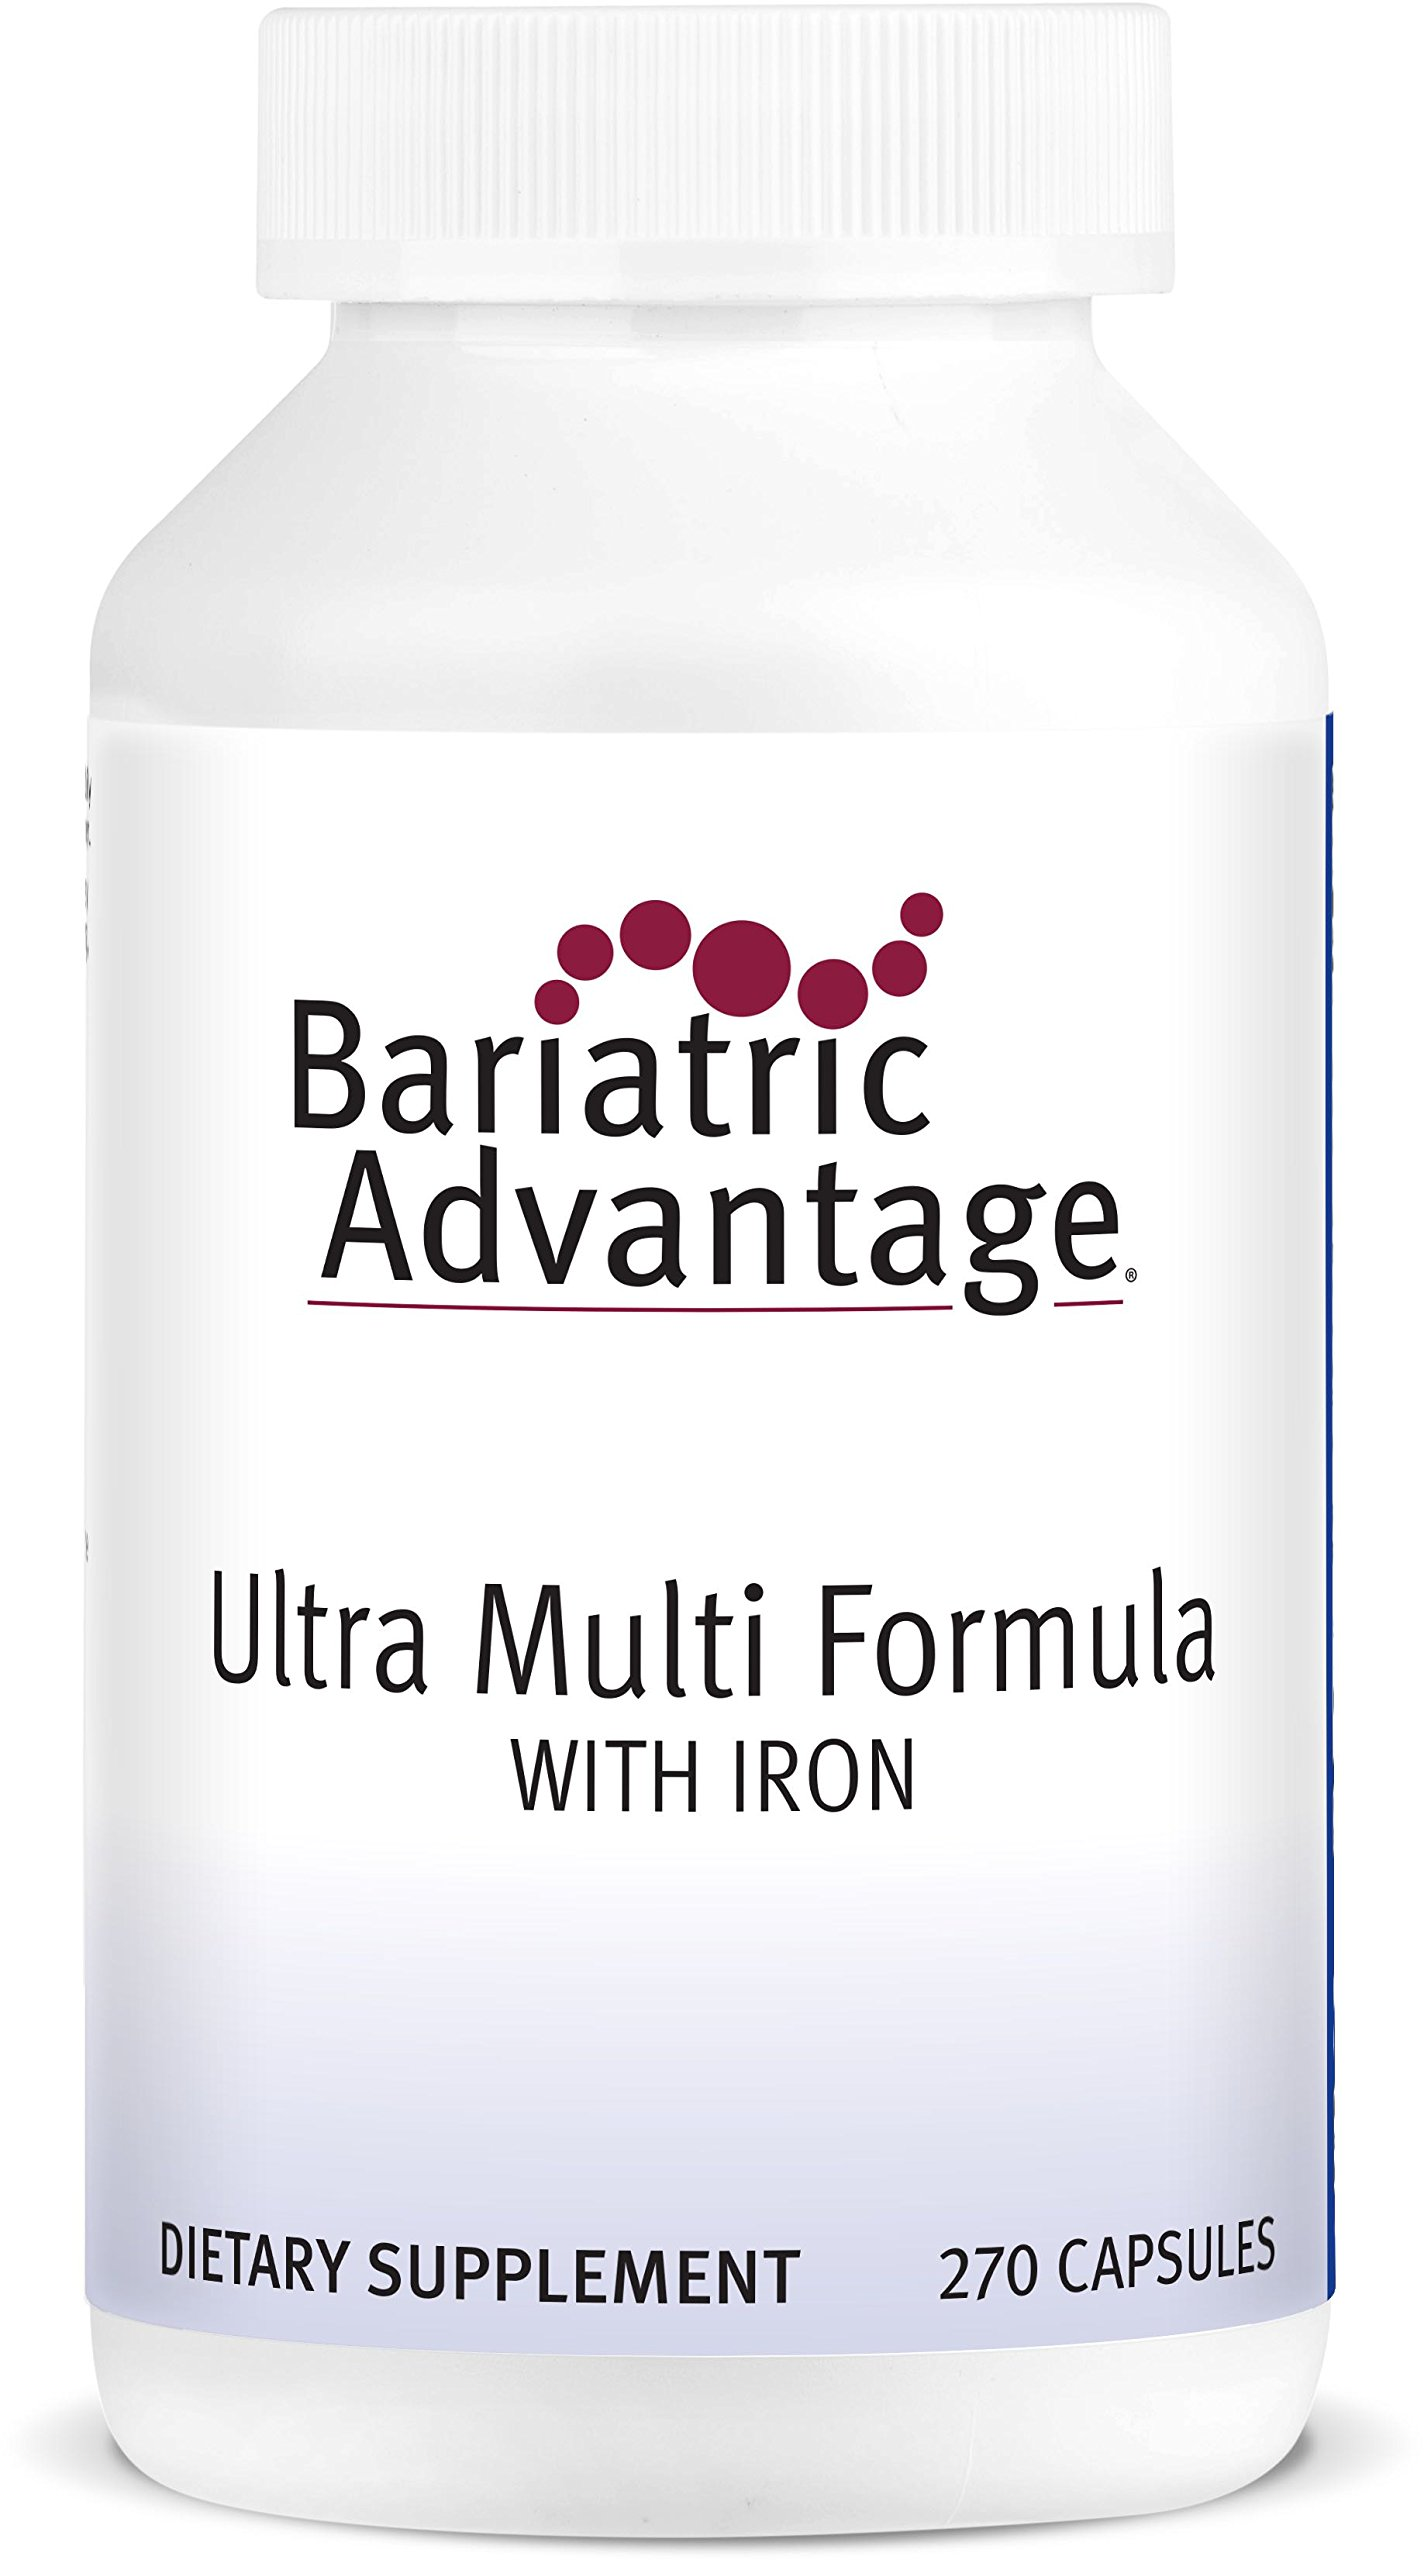 Bariatric Advantage - Ultra Multi Formula with Iron, 270 Count